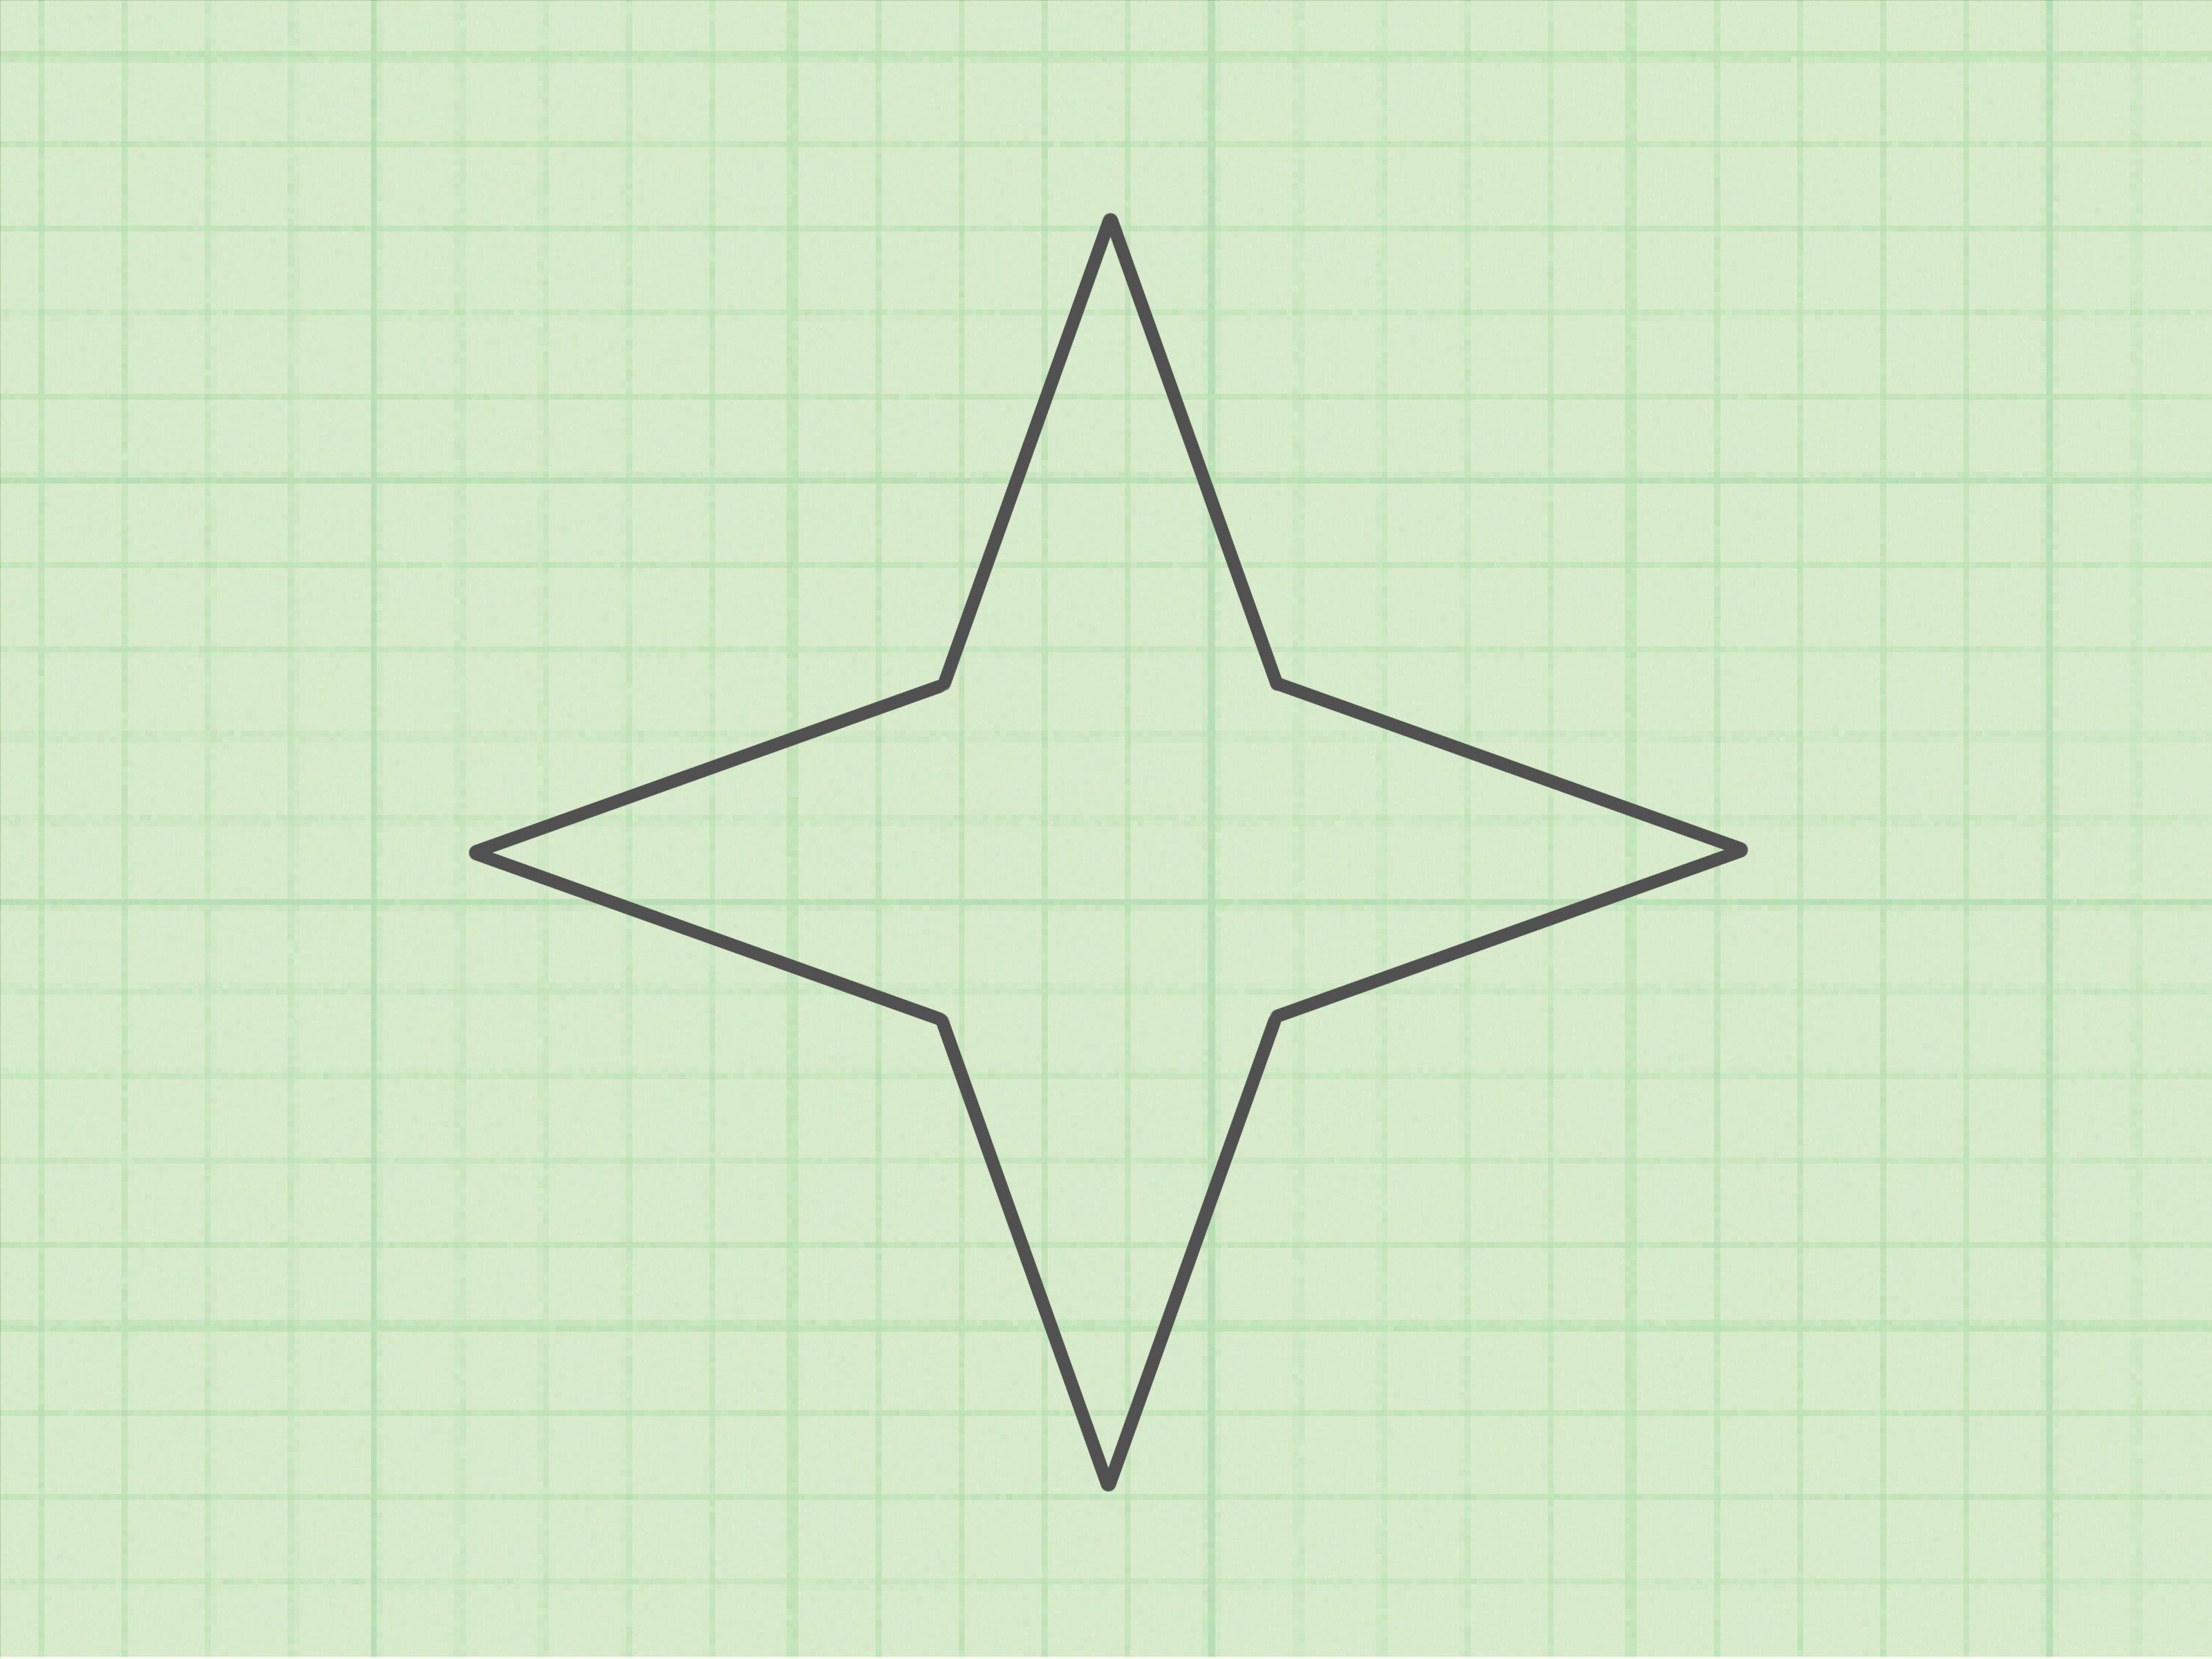 4 Ways To Make An Octagon